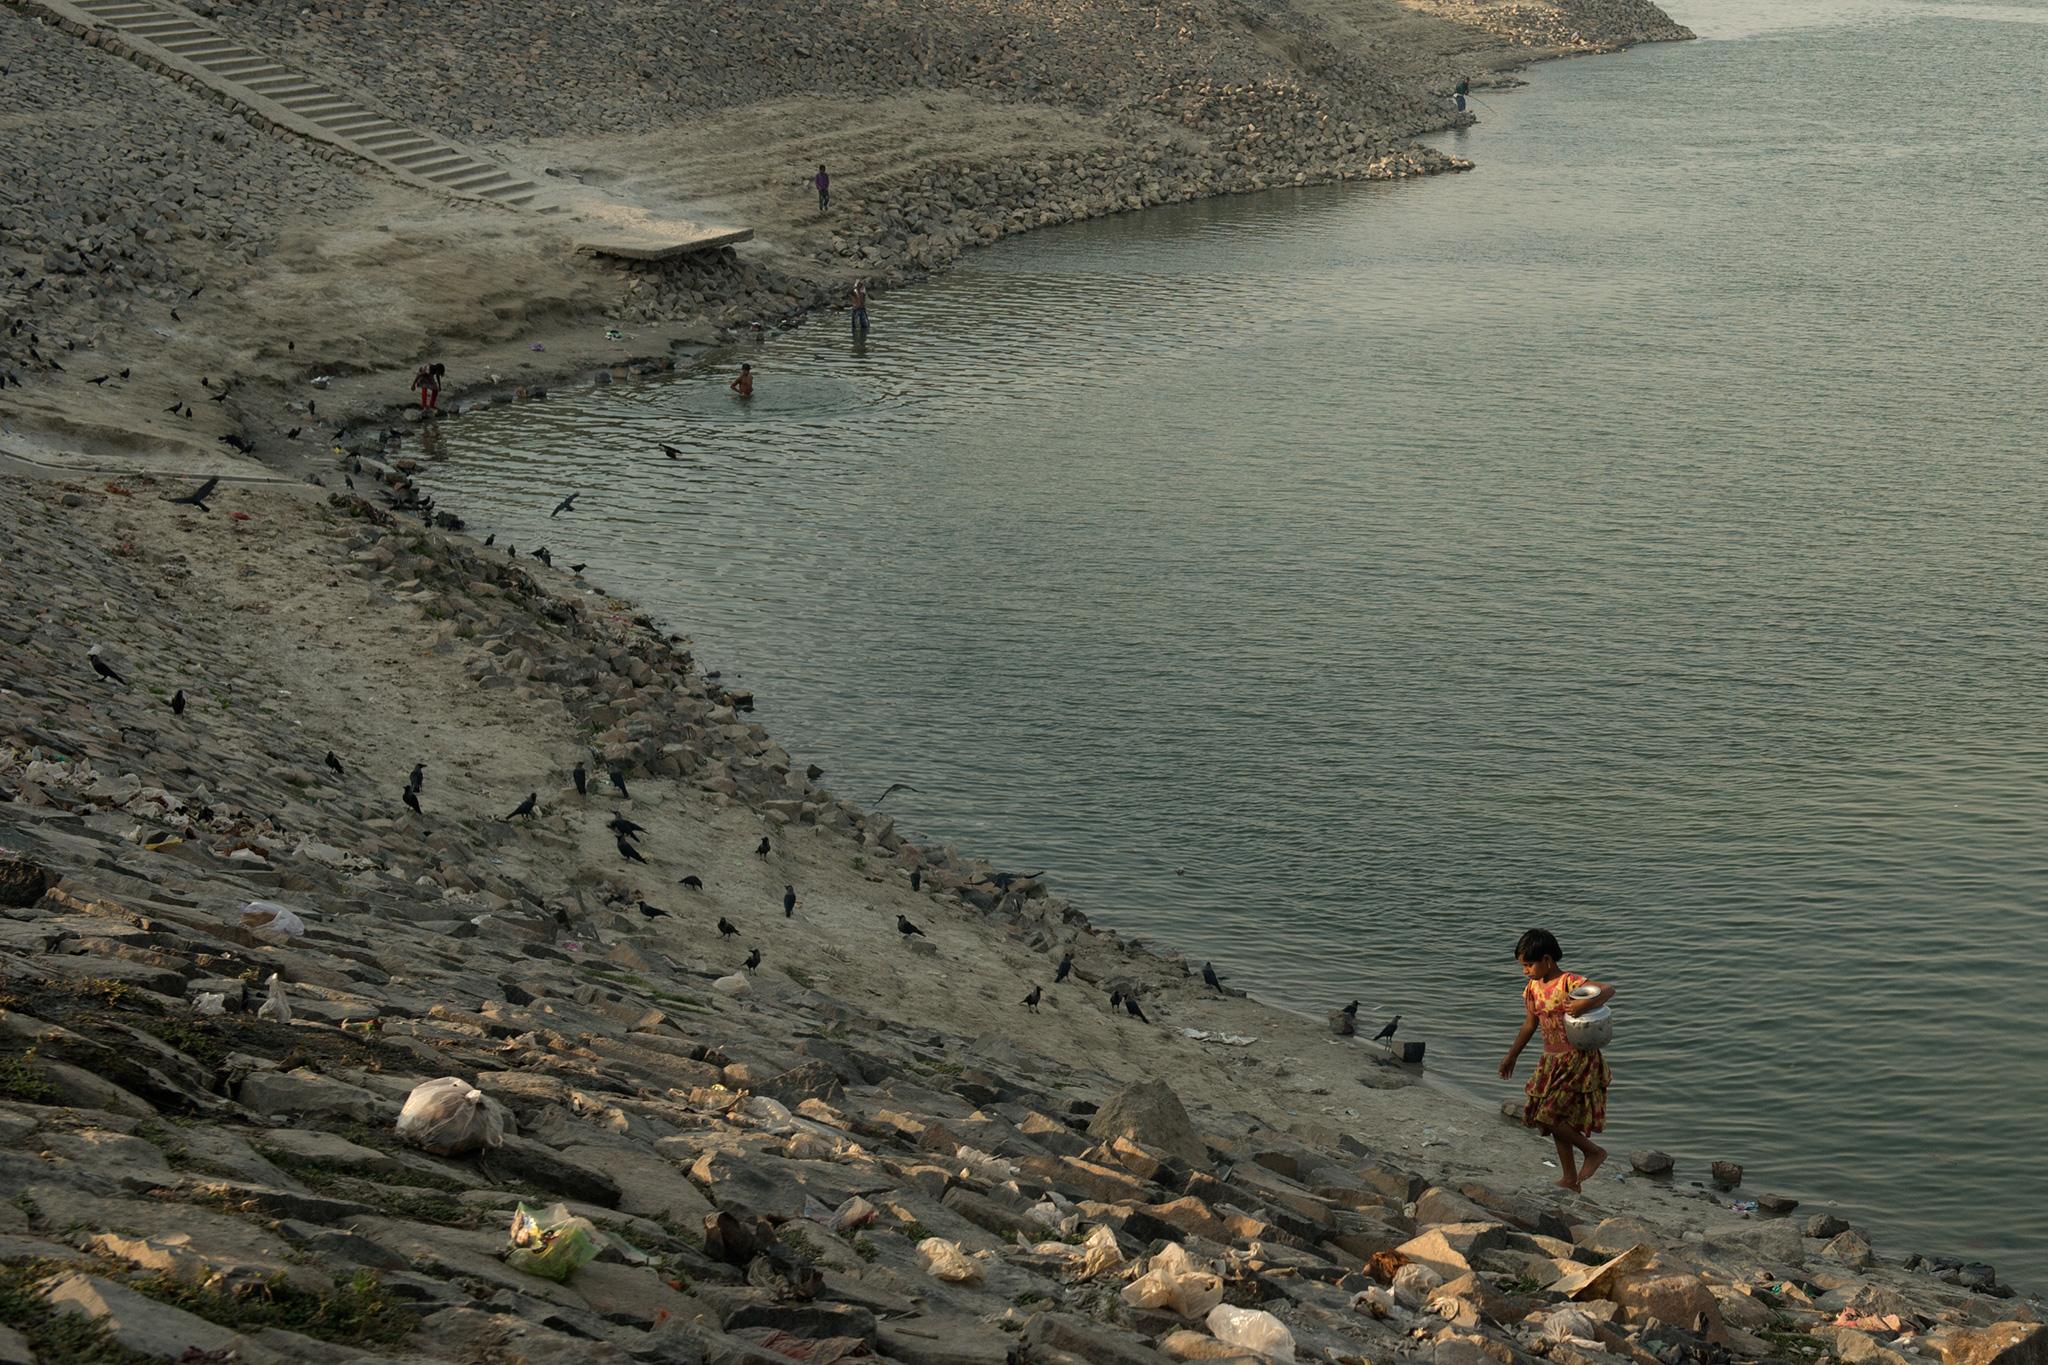 Dhulian_refugees_water2.jpg